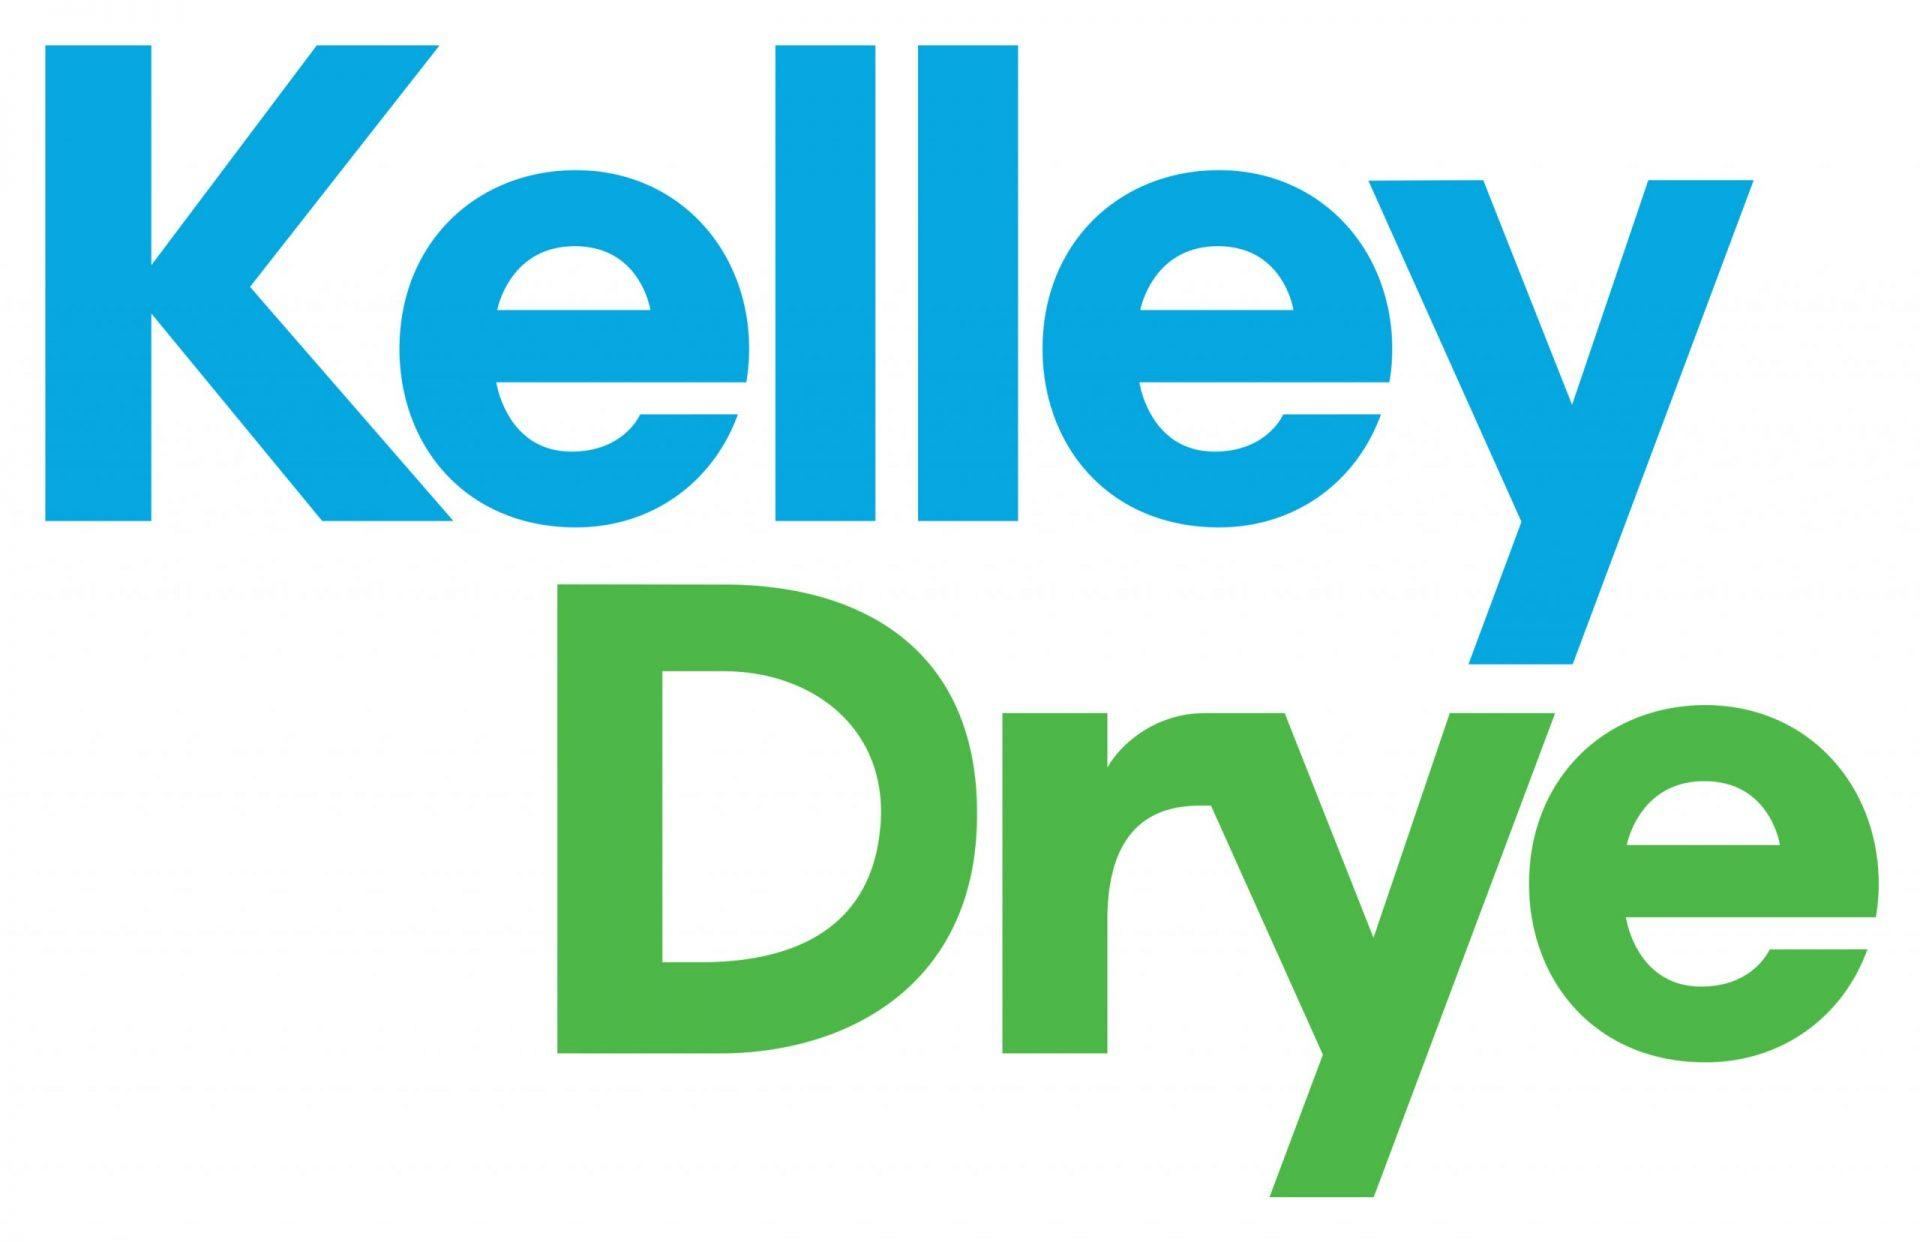 Kelley_Drye_logo_bluegreen_high_resolution_v1